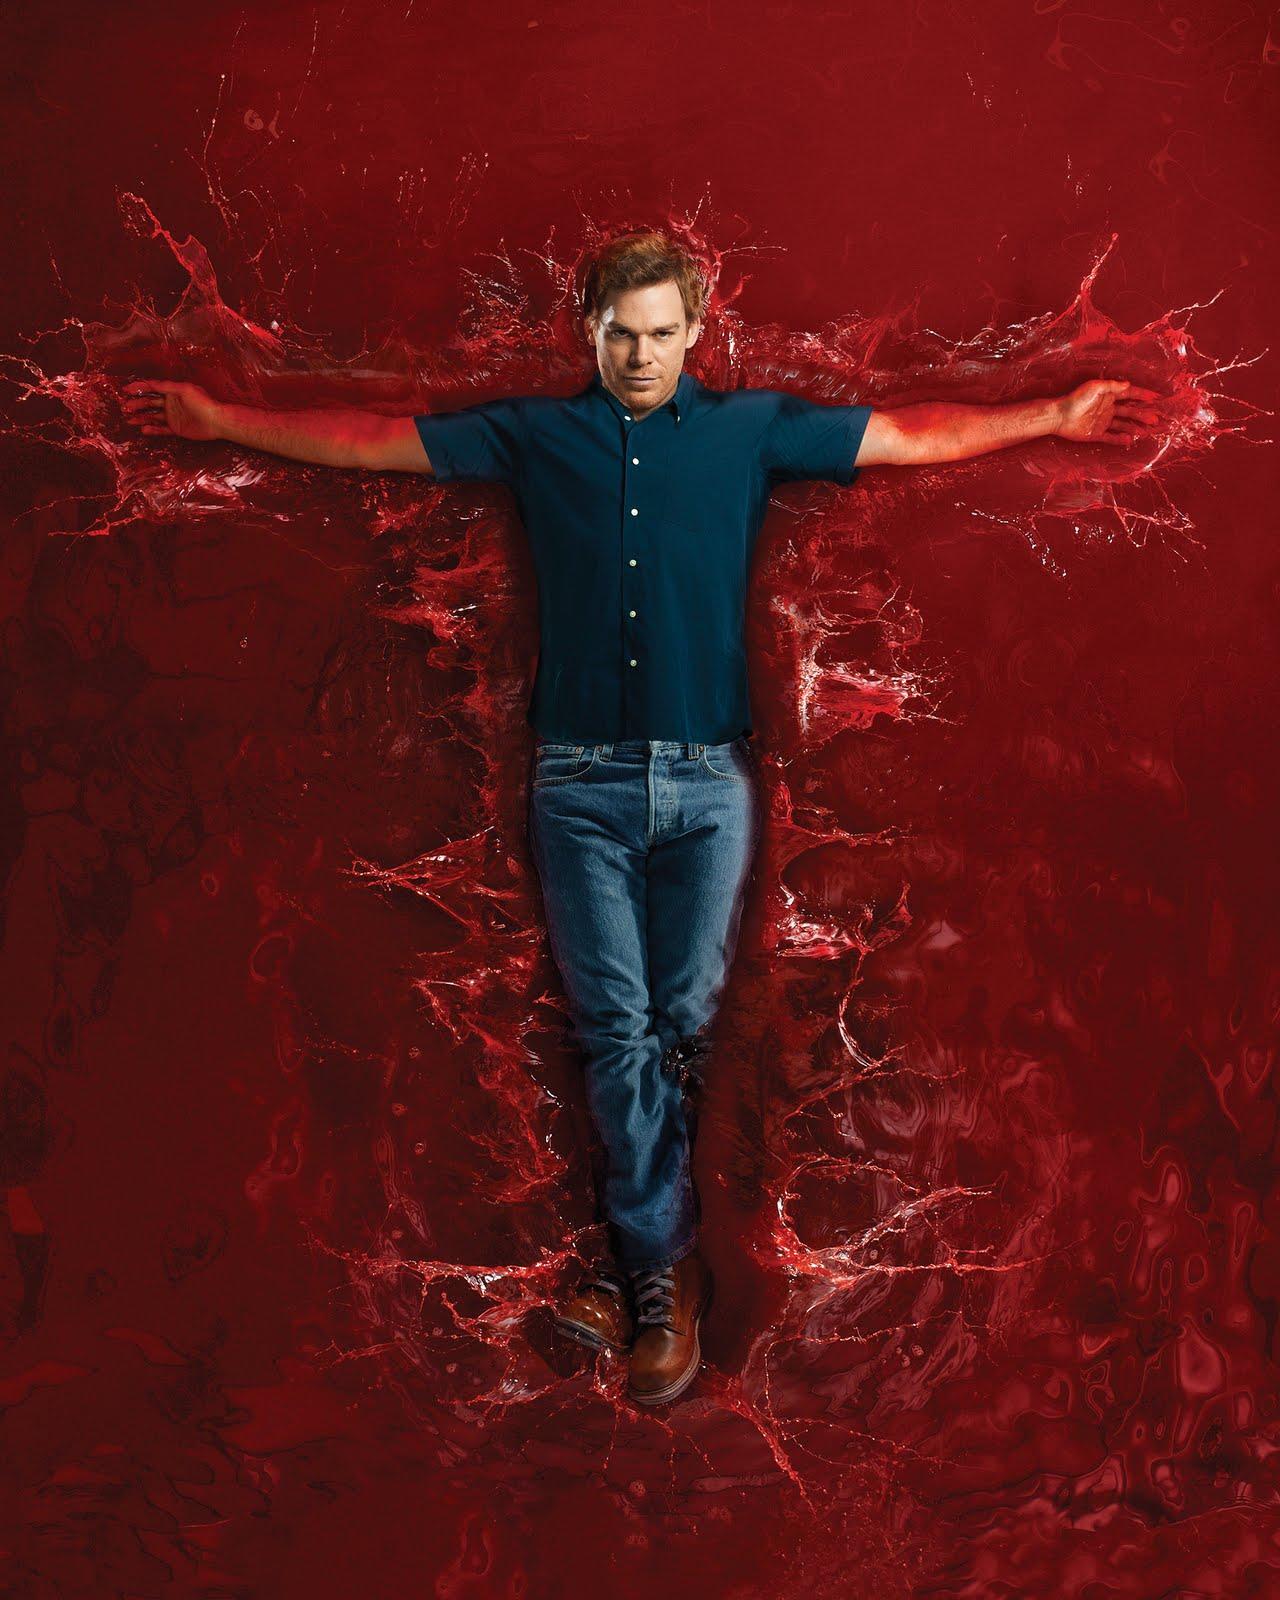 http://2.bp.blogspot.com/-v9WYL9yiFt4/Tnd3IHapi6I/AAAAAAAAAvI/2urdhNA91wA/s1600/Dexter-poster-season-6-2.jpg